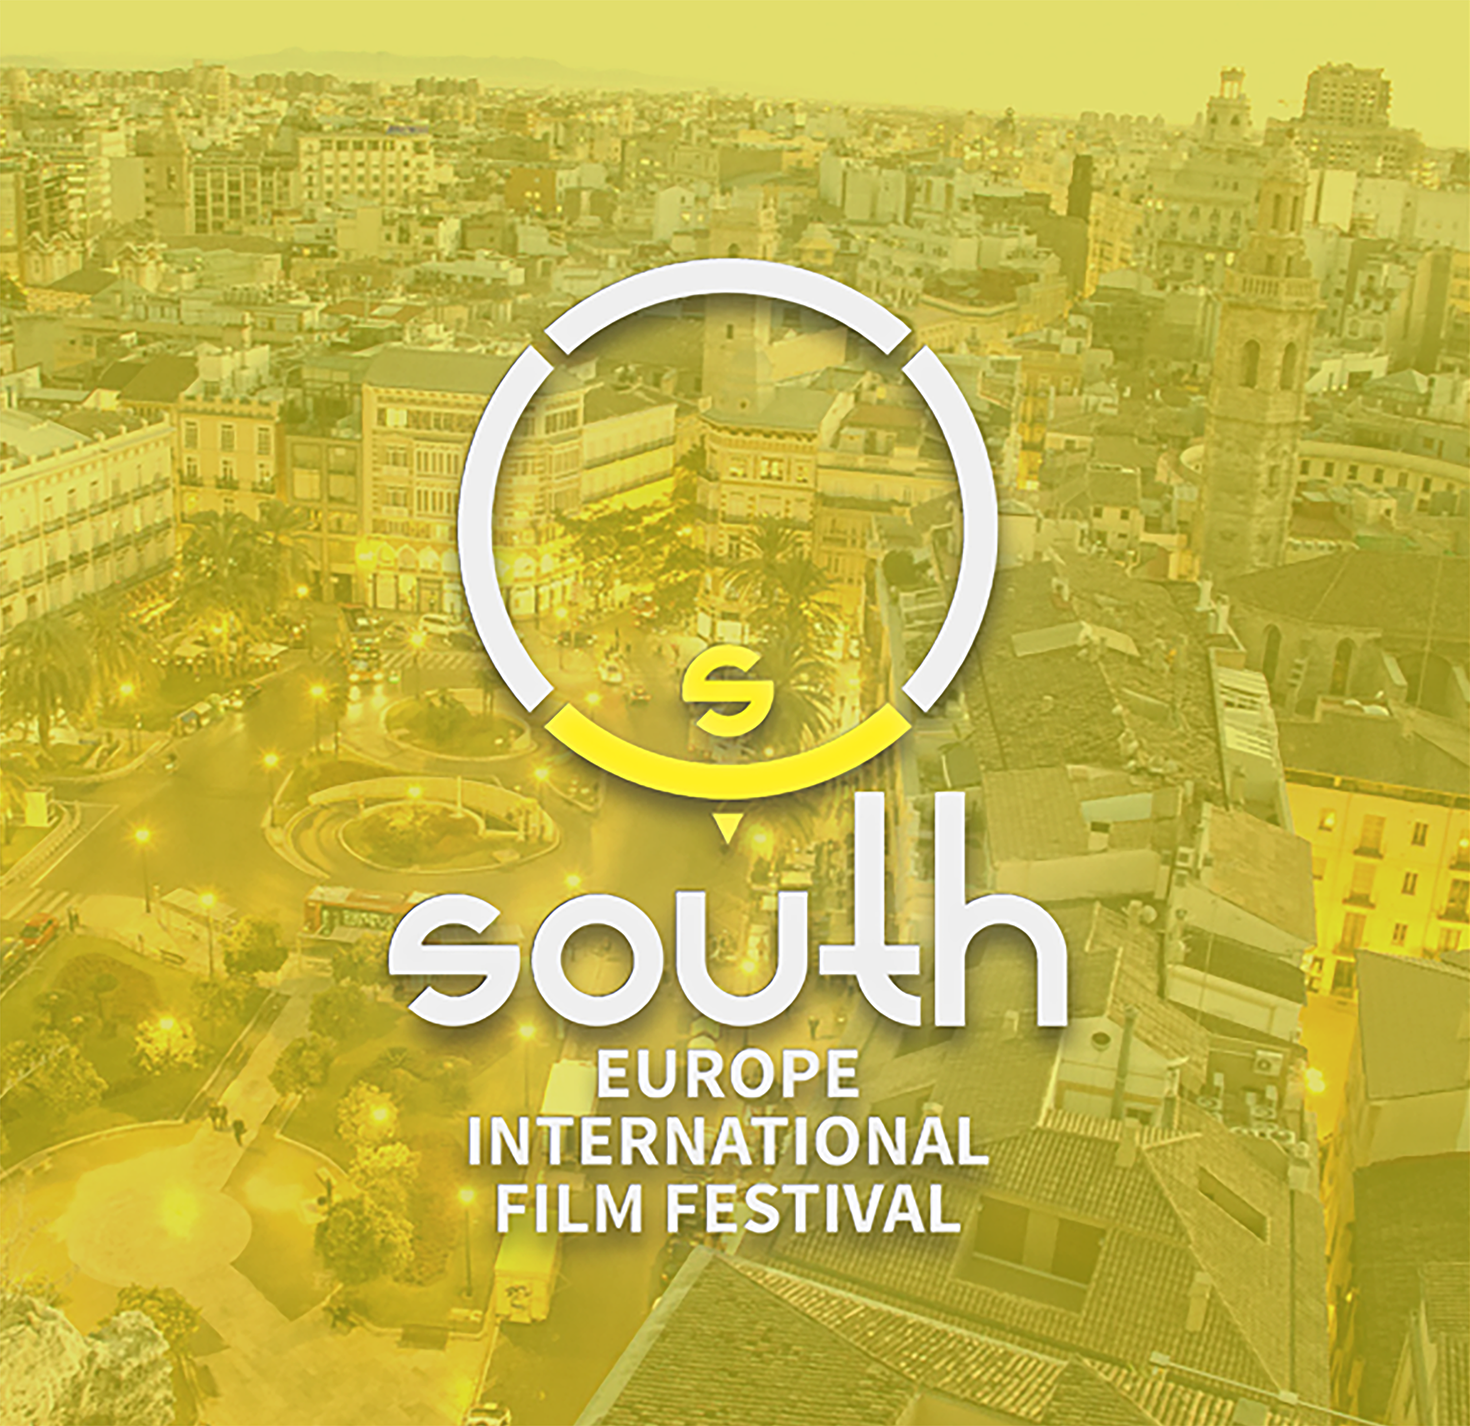 South Europe International Film Festival.png